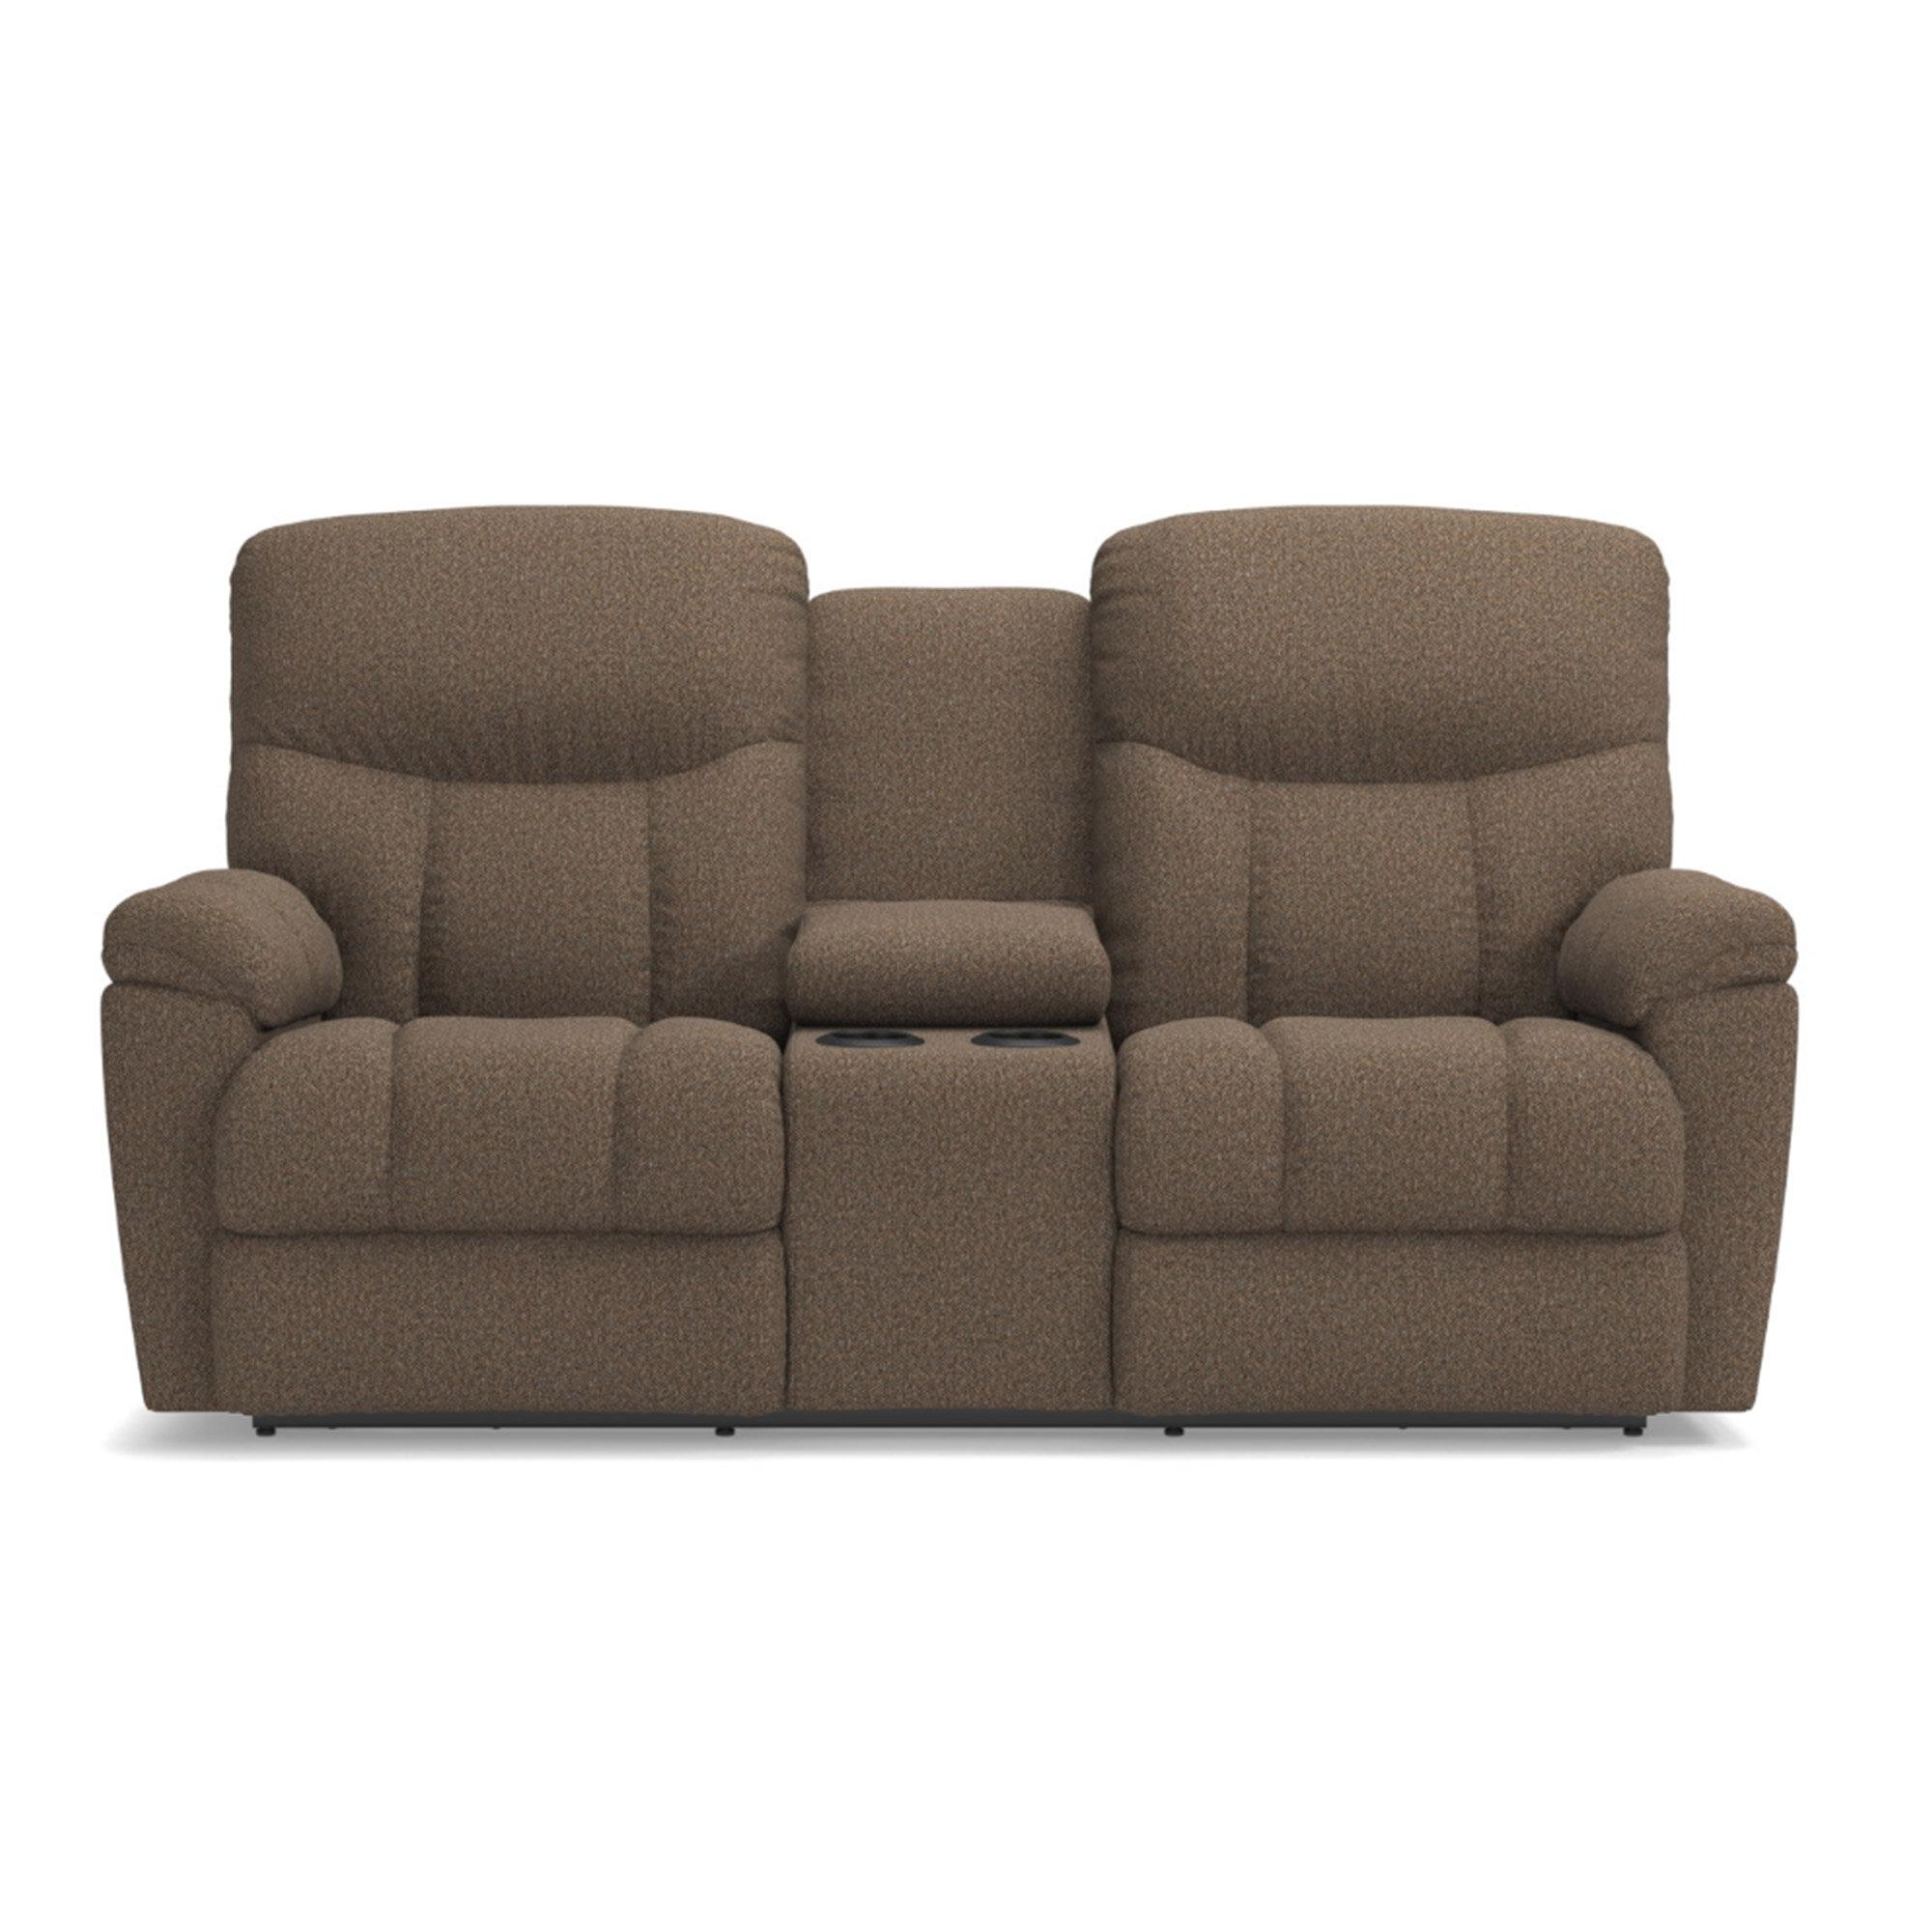 La-Z-Boy Morrison Reclining Sofa | Wayfair